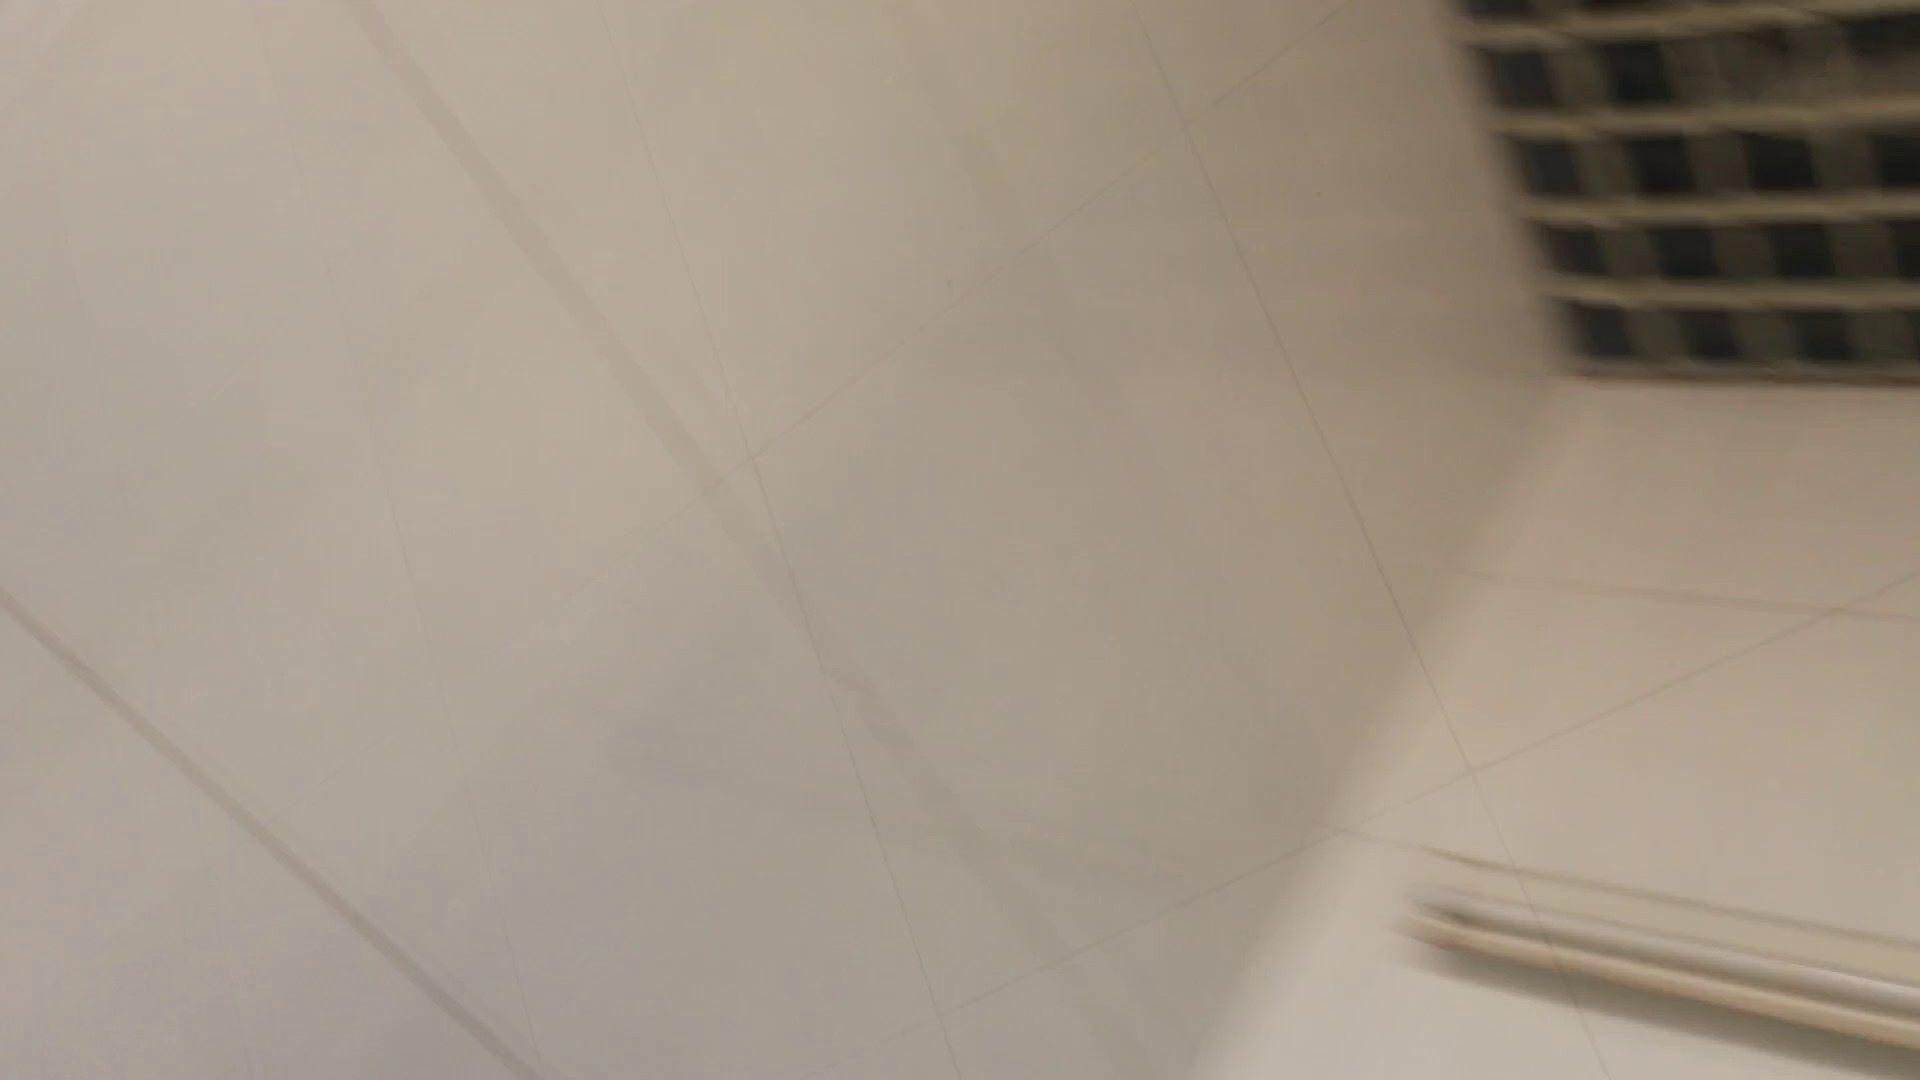 芸術大学ガチ潜入盗撮 JD盗撮 美女の洗面所の秘密 Vol.91 丸見え  85枚 22